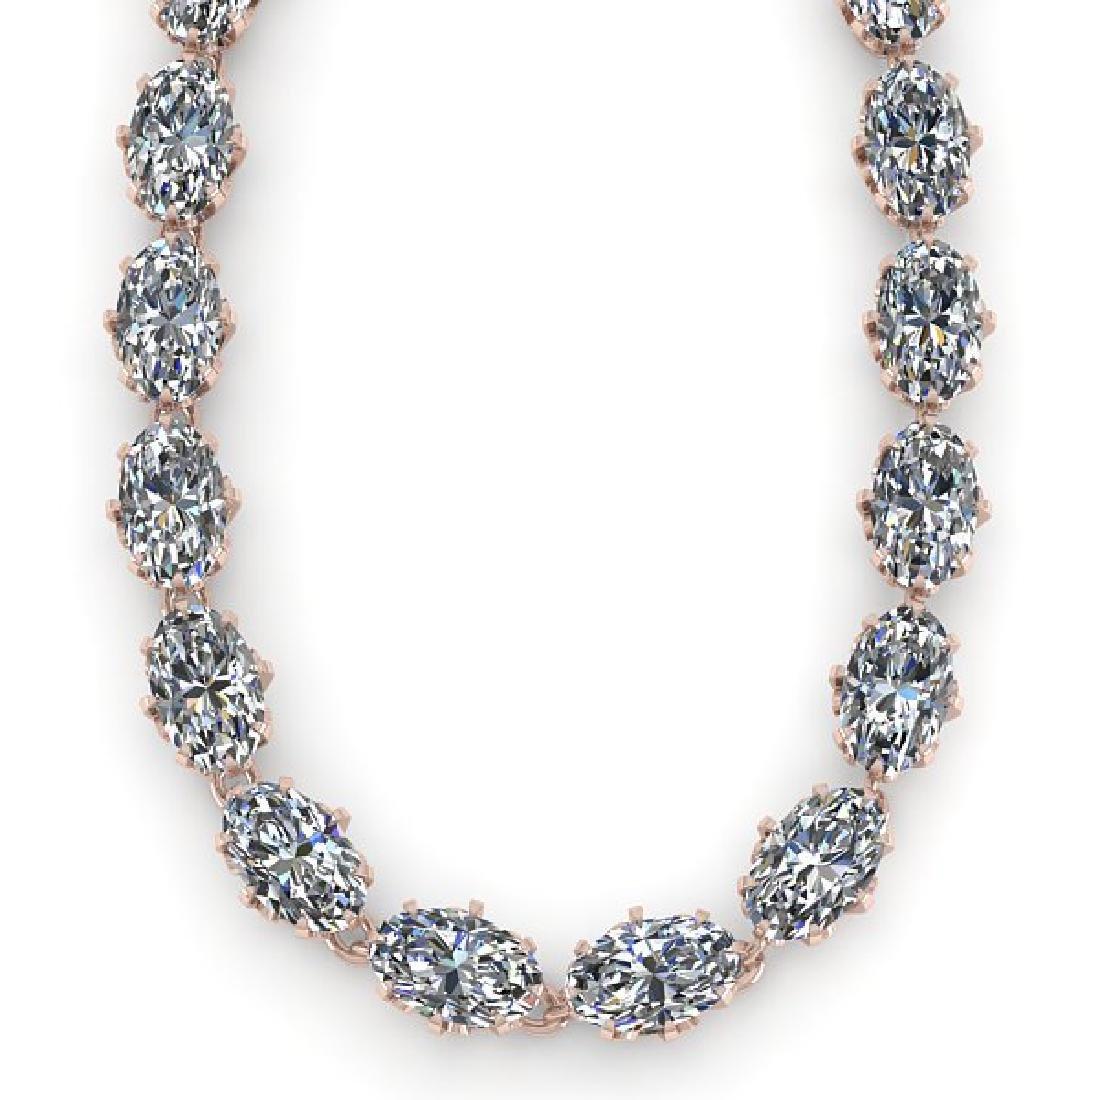 40 CTW Princess SI Certified Diamond Necklace 14K Rose - 2